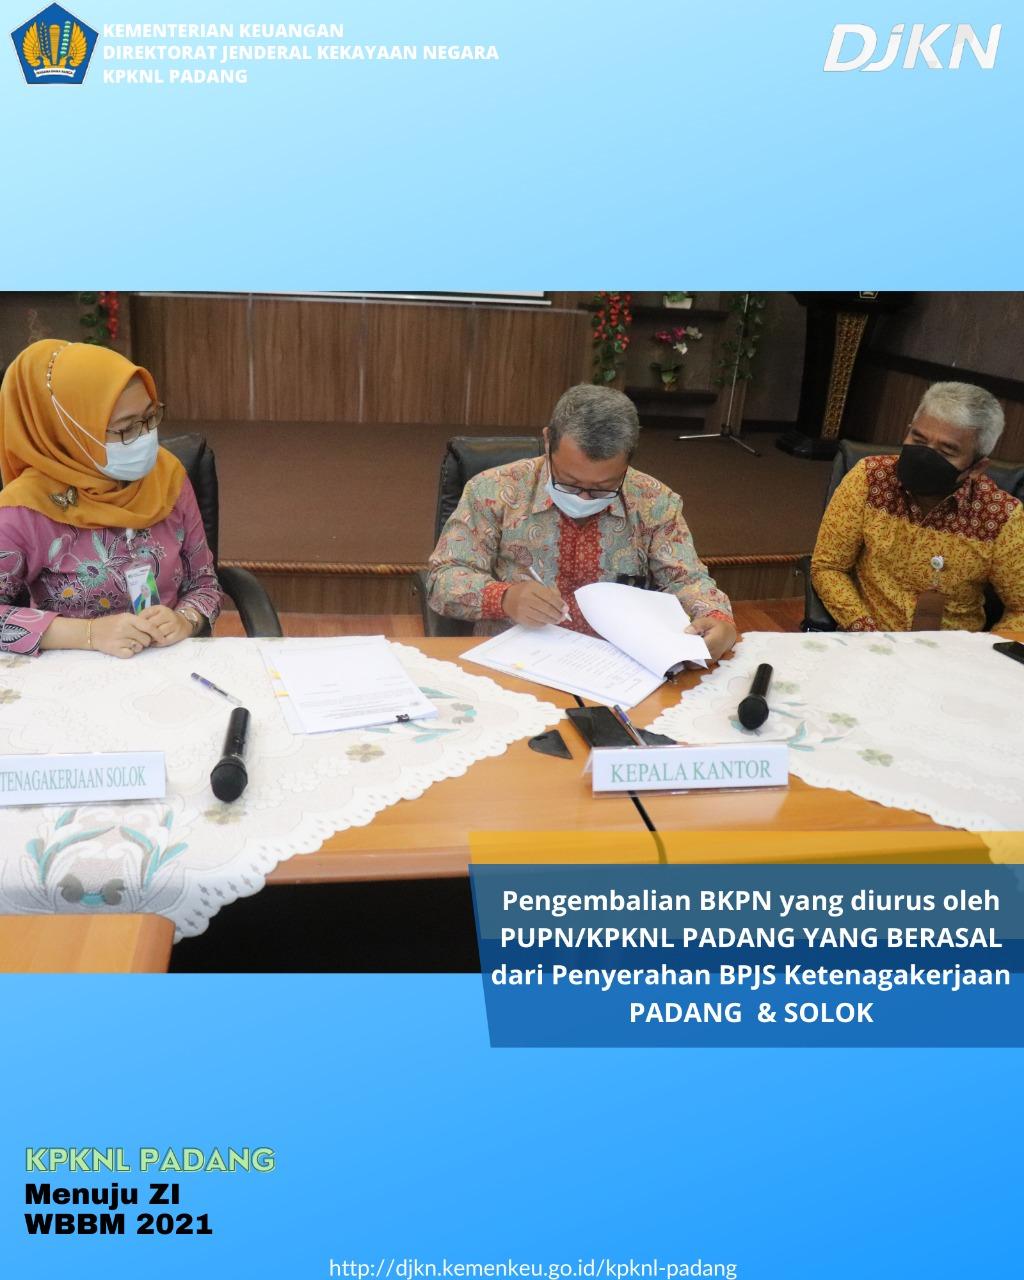 Pupn Kpknl Padang Melakukan Serah Terima Pengembalian Bkpn Yang Berasal Dari Penyerahan Bpjs Ketenagakerjaan Padang Dan